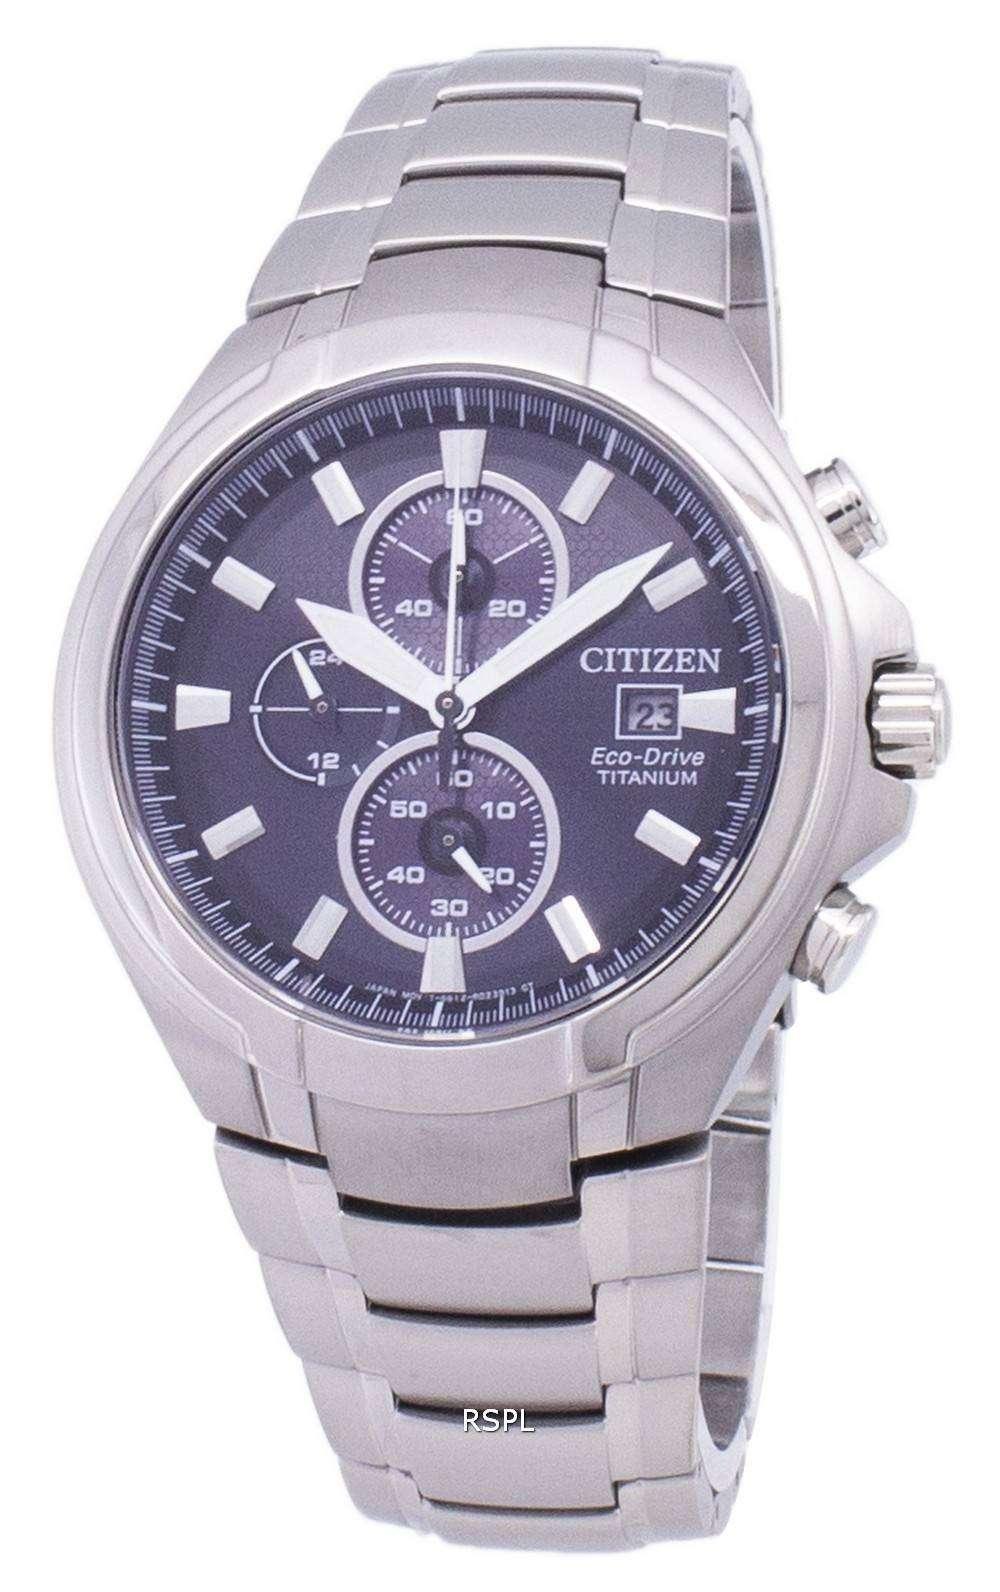 d1f2cbe57a1 Citizen Eco-Drive CA0700-86E Chronograph Titanium Men s Watch ...